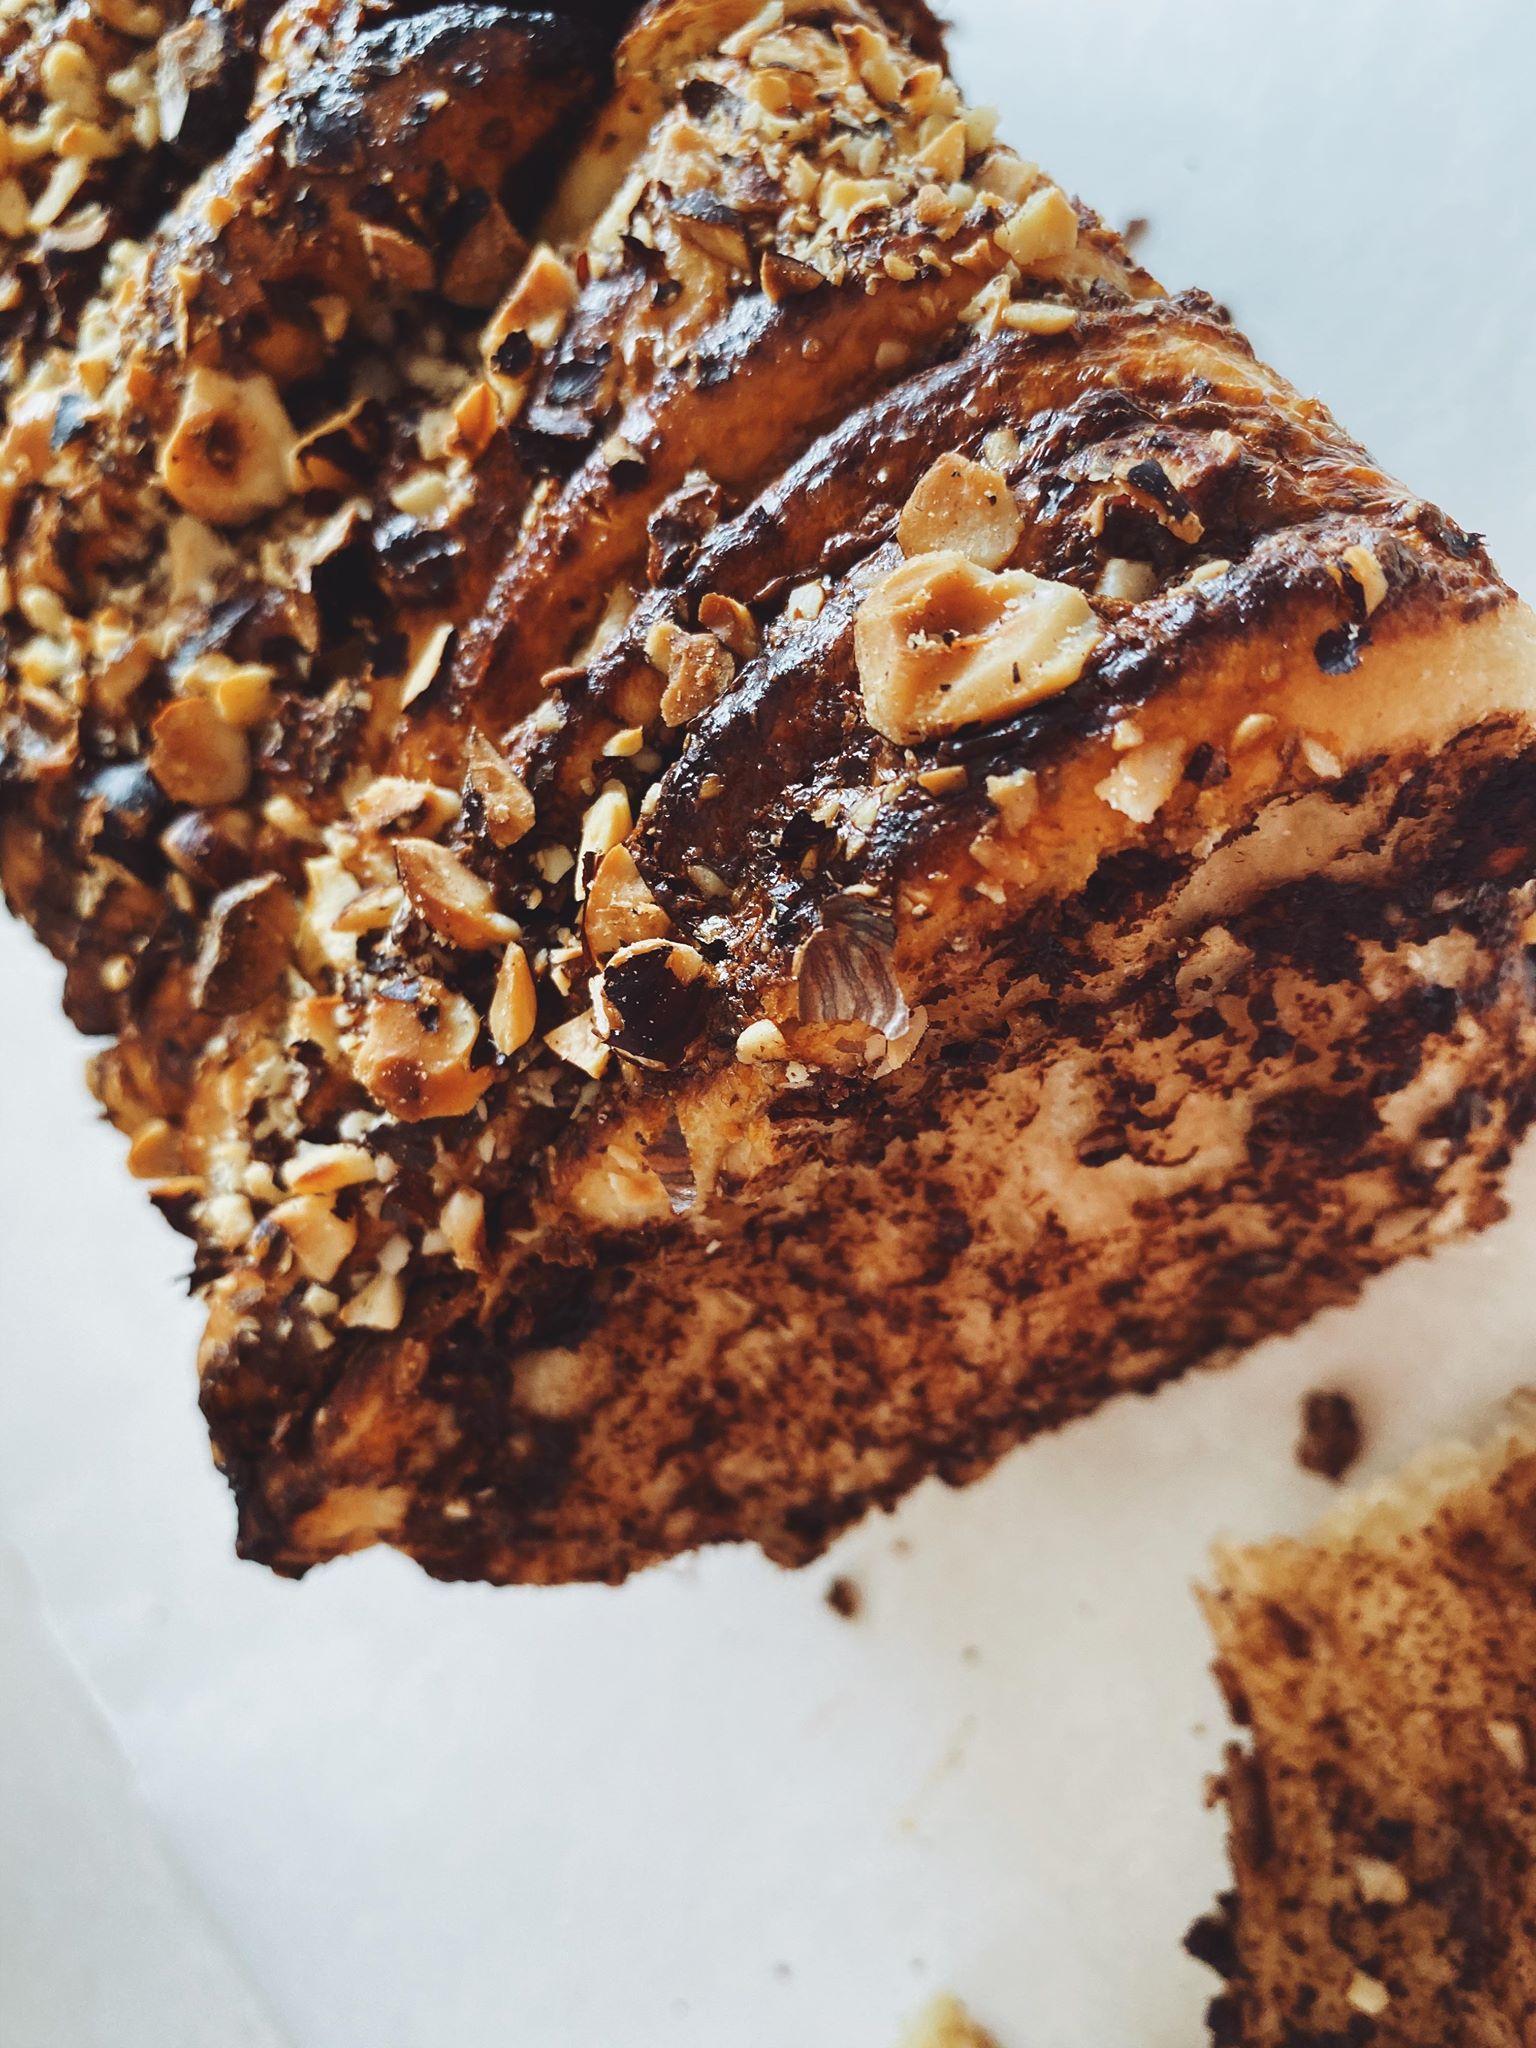 Pull-apart brød med nutella og hasselnødder